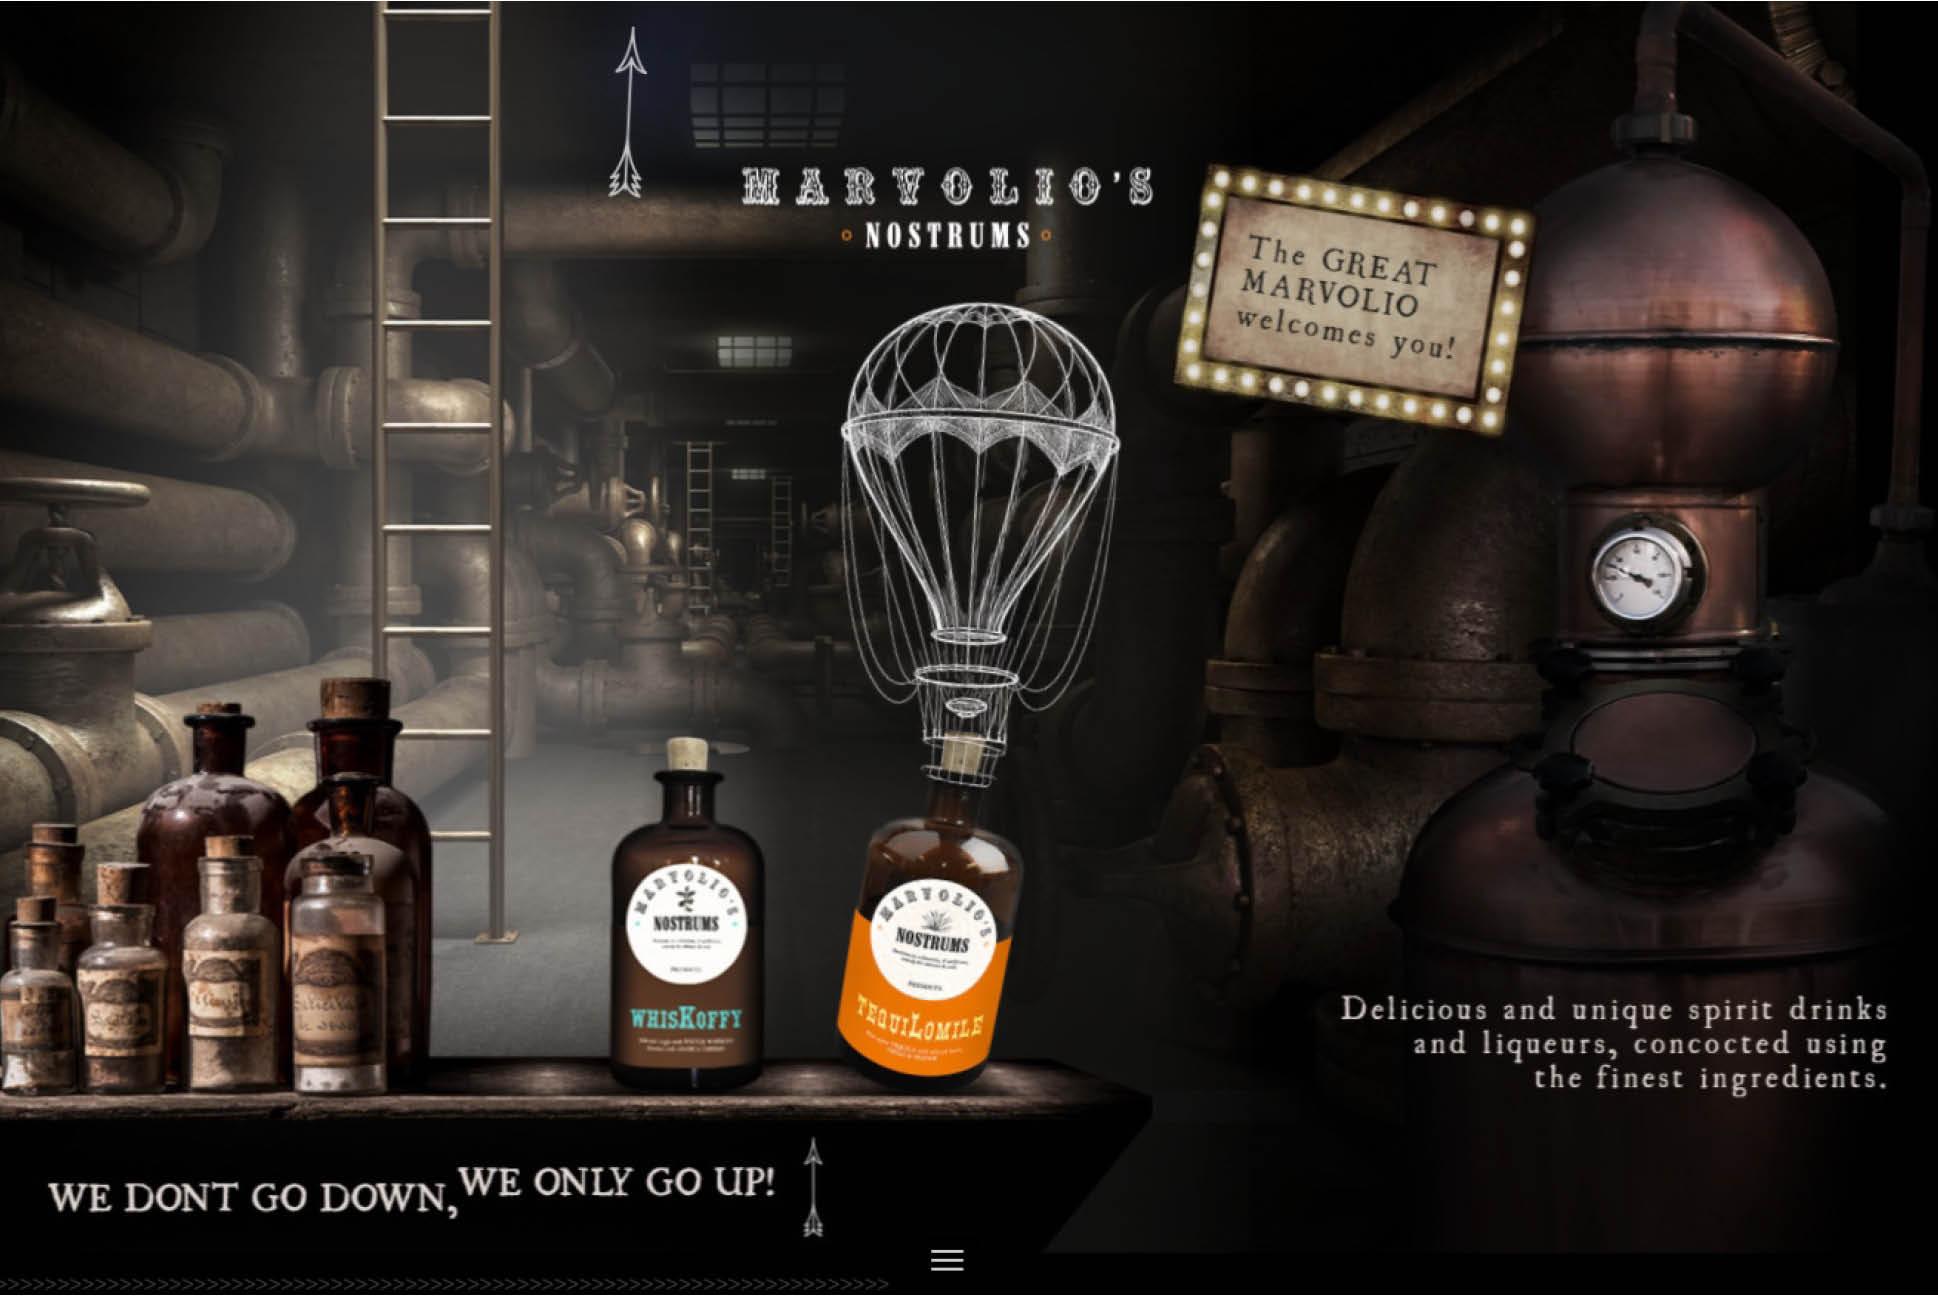 Marvolio's Nostrums | Independent Marketing Packaging, Design and Website Design Services | IM London